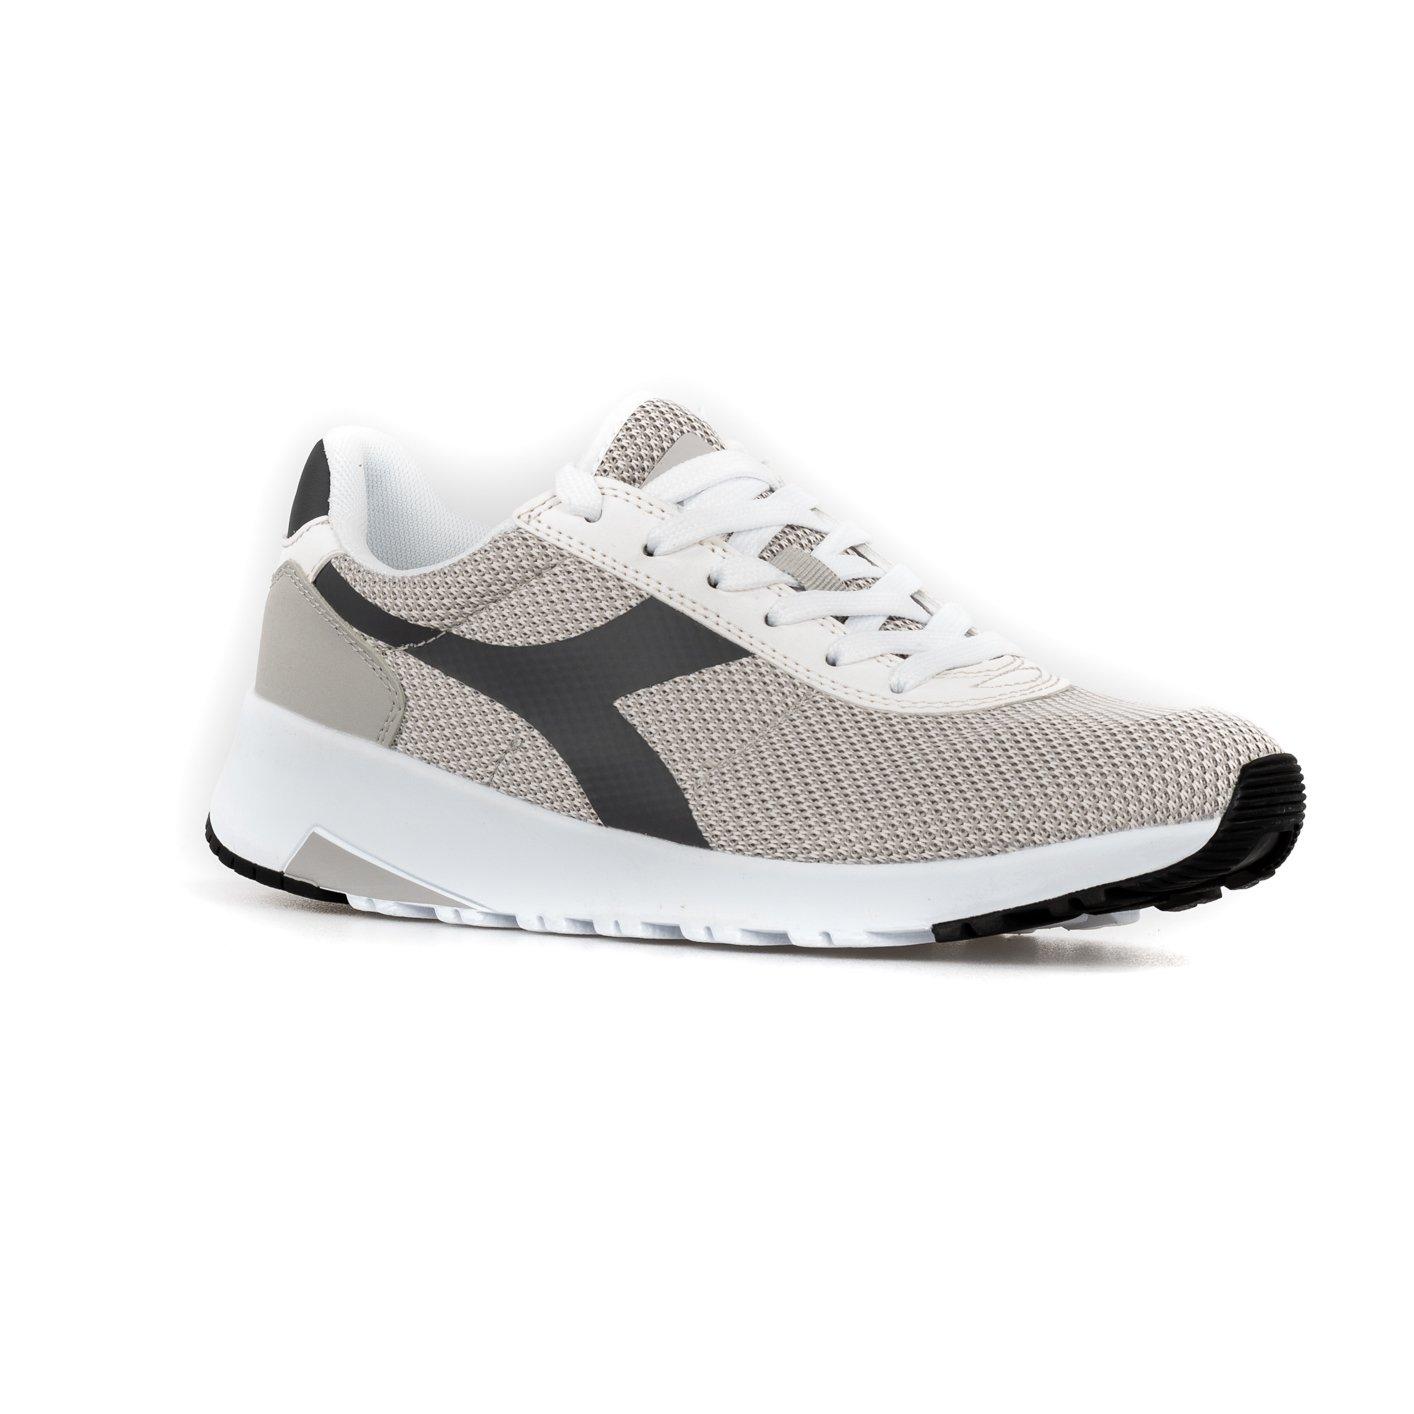 Schuhe Diadora Evo Run II Art.173093  44.5 EU Bianco